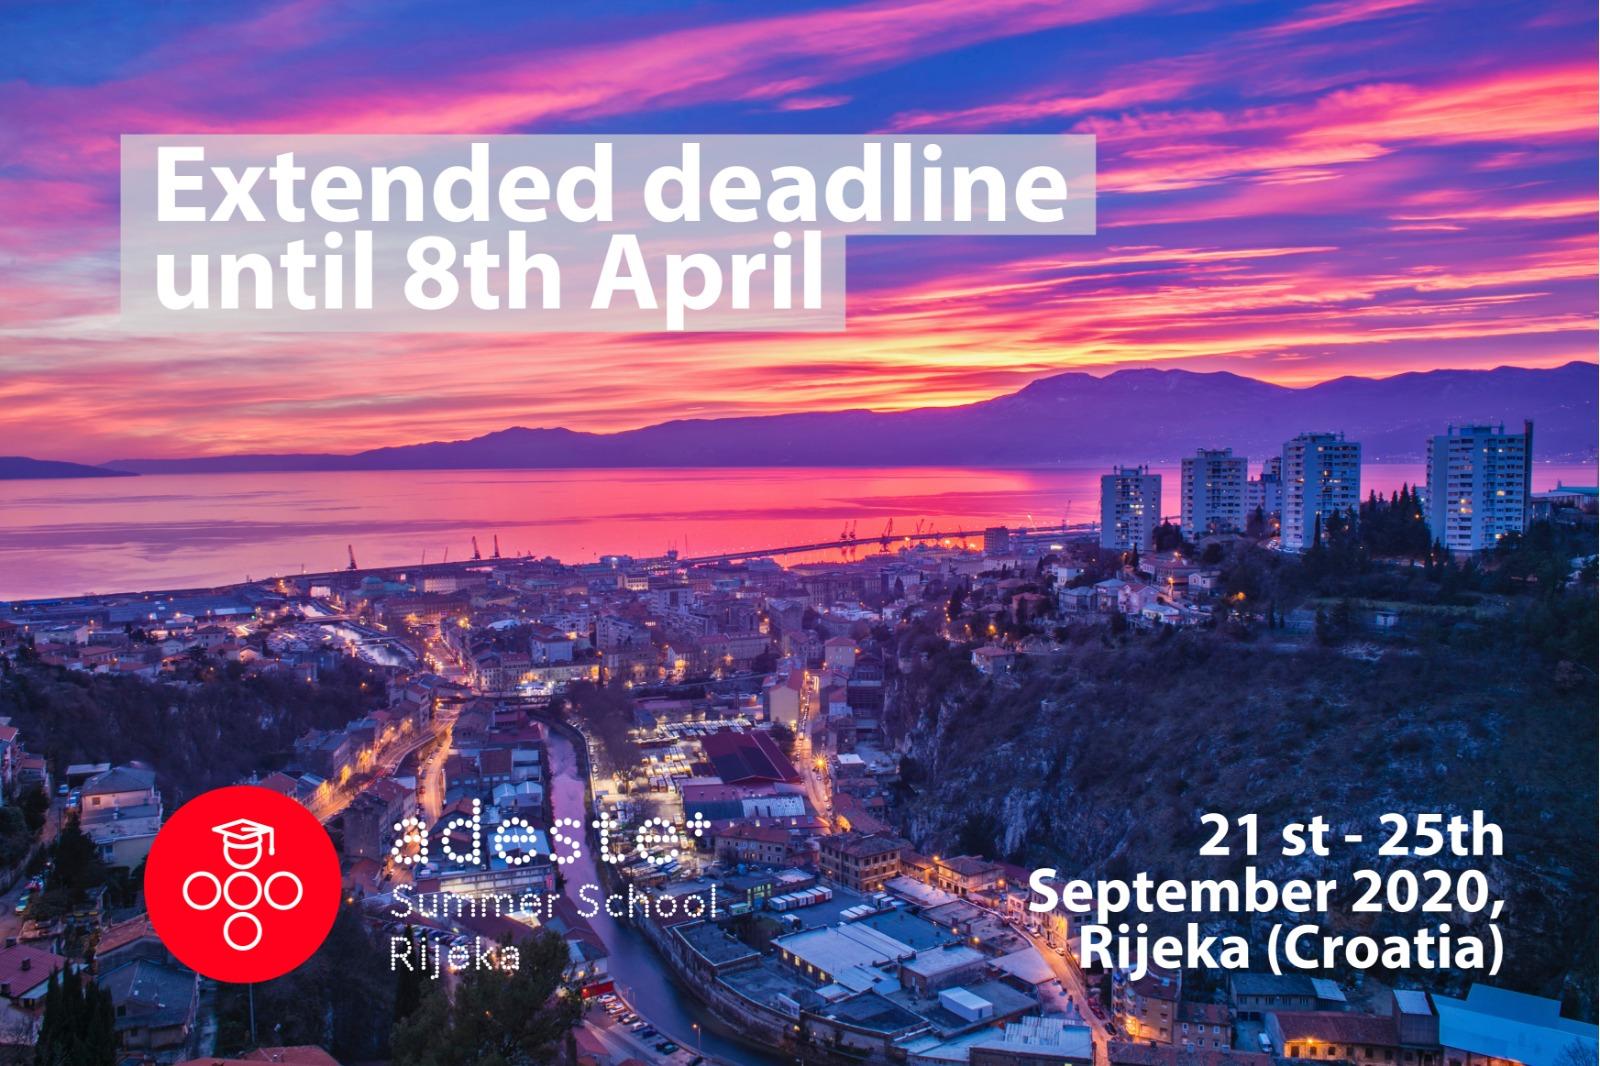 Extended deadline until 8th April